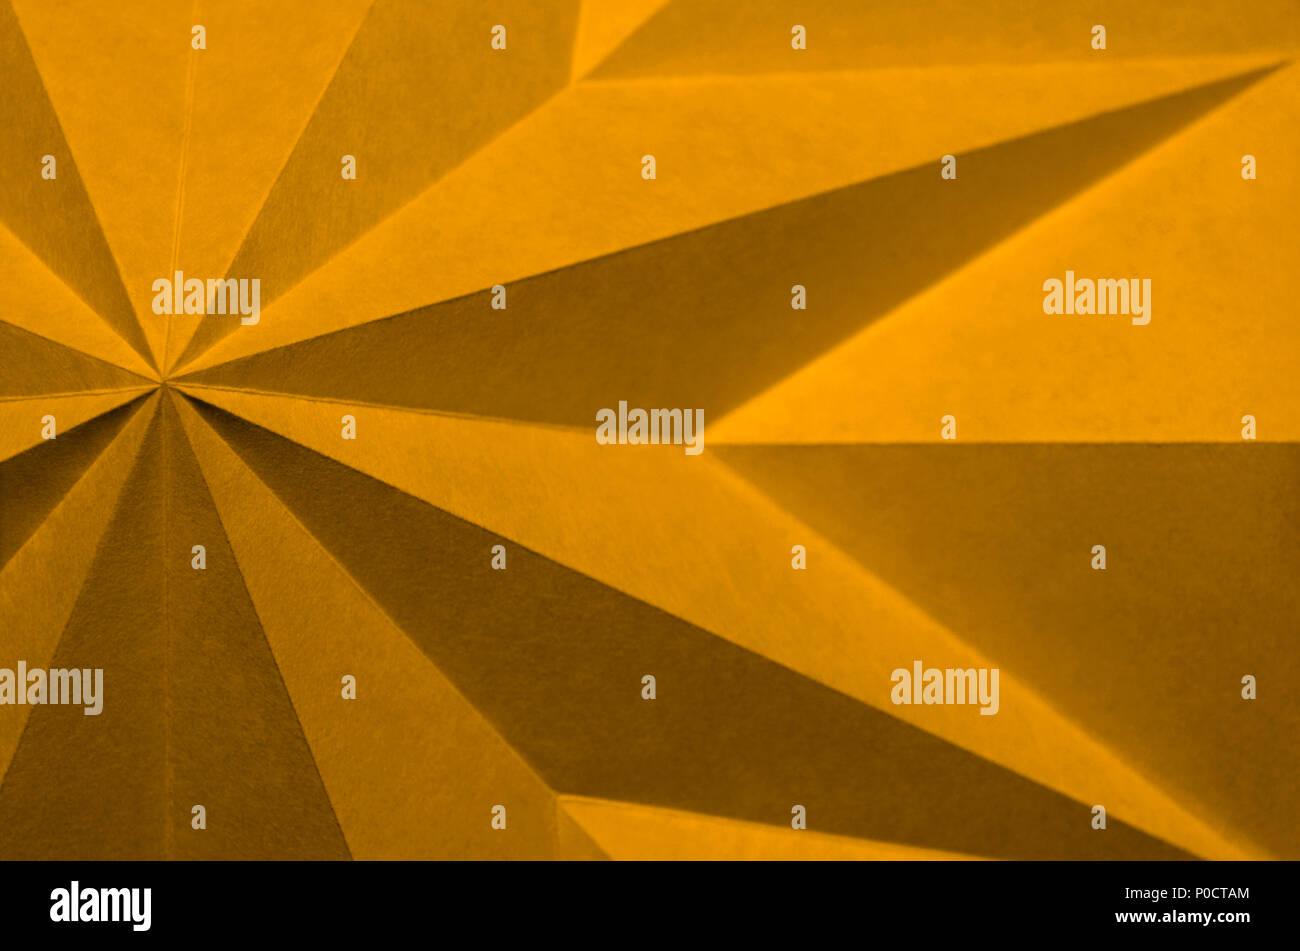 orange, Citrus Pantone 14-0955, Origami; folded paper texture, one colour, one colour, close up,macro abstract, angular design element. - Stock Image